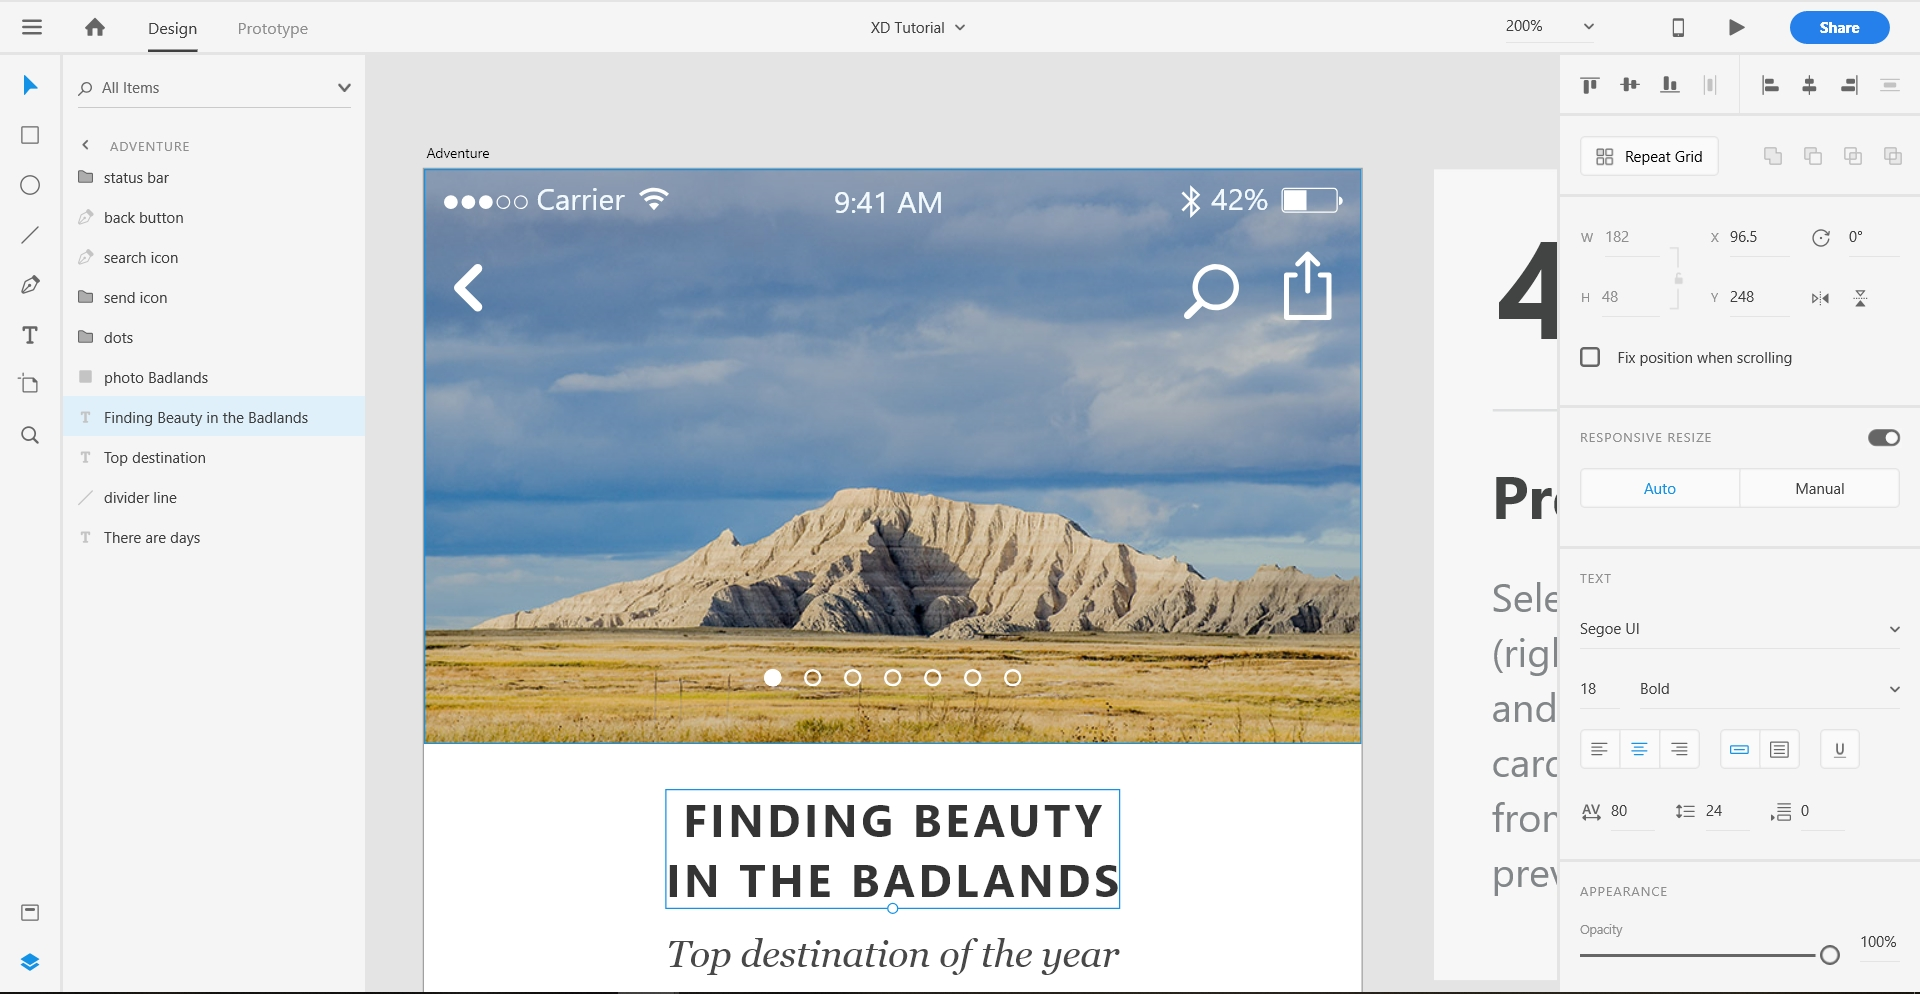 Adobe XD Designing tool